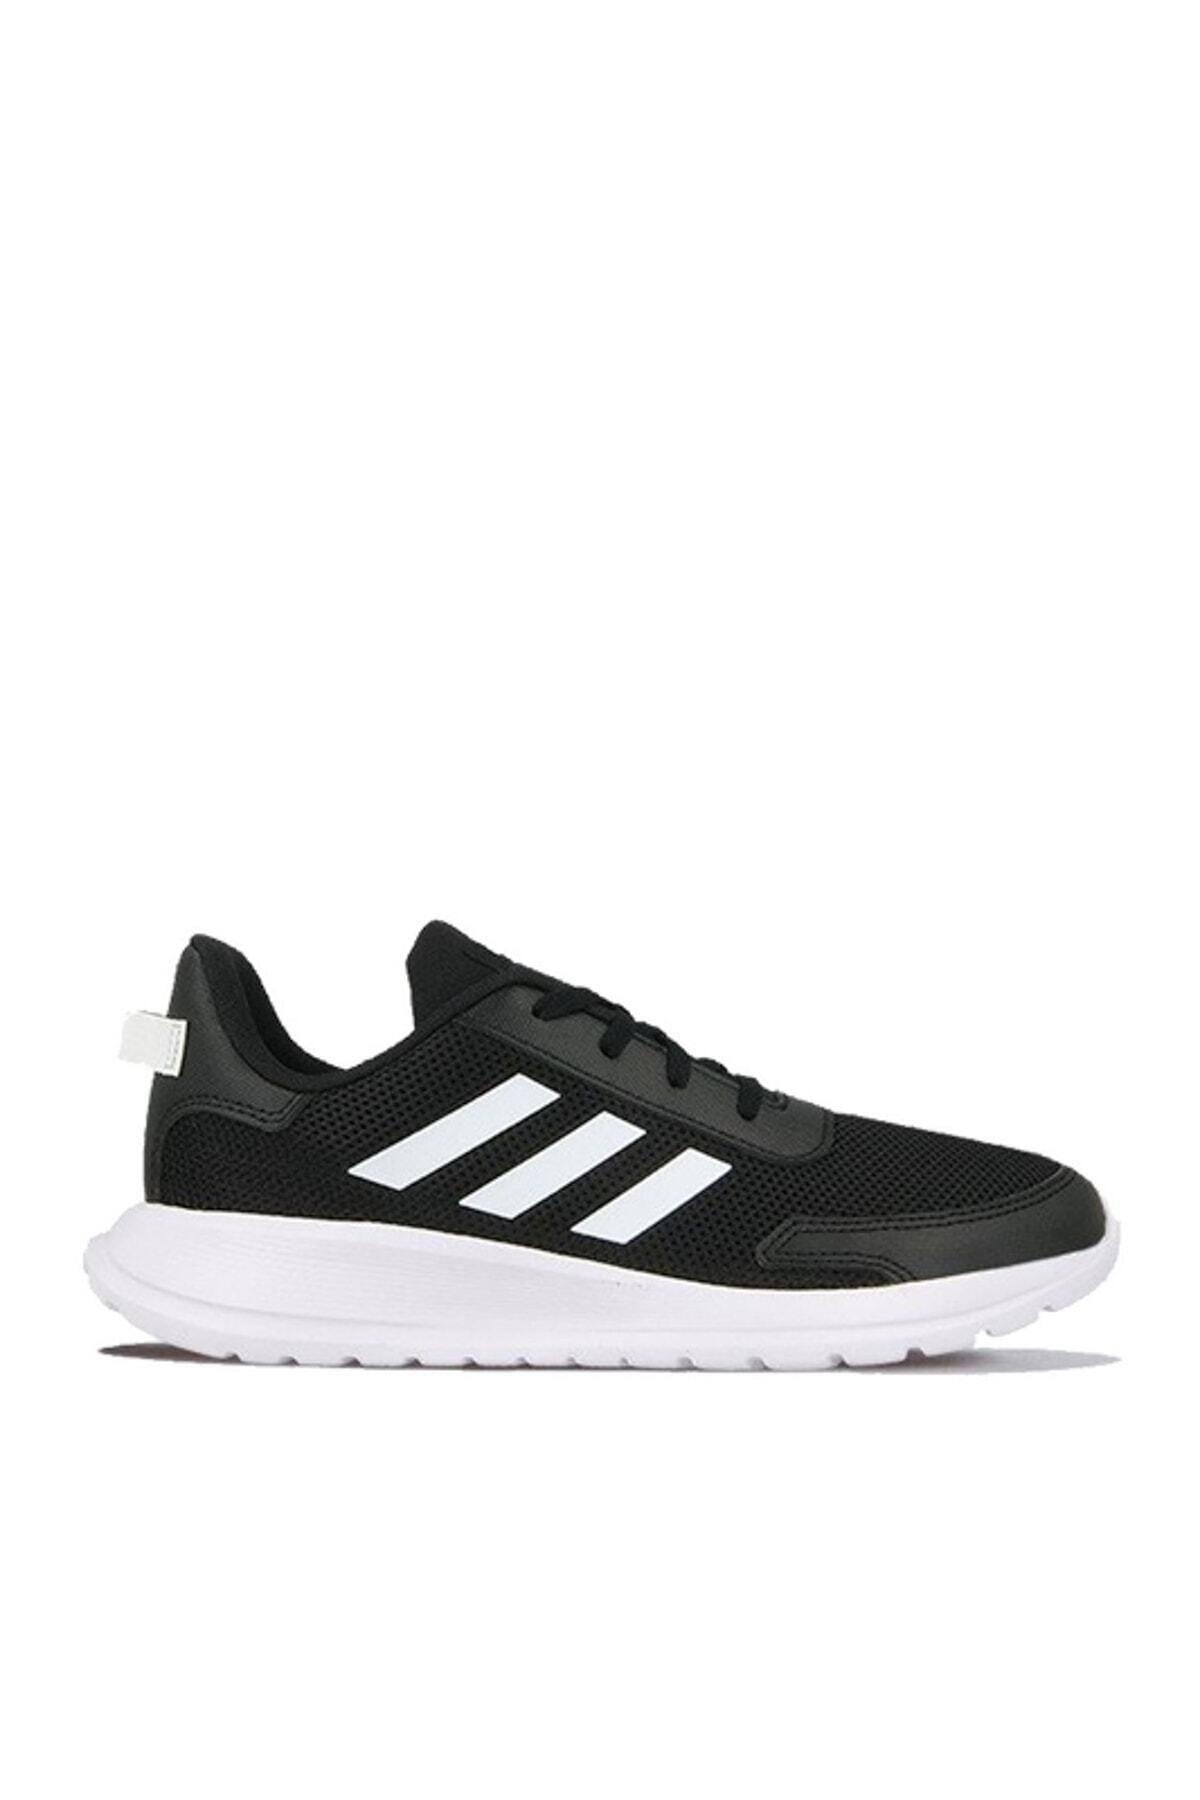 کفش اسپرت بچه گانه پسرانه  جدید برند ادیداس رنگ مشکی کد ty35075565